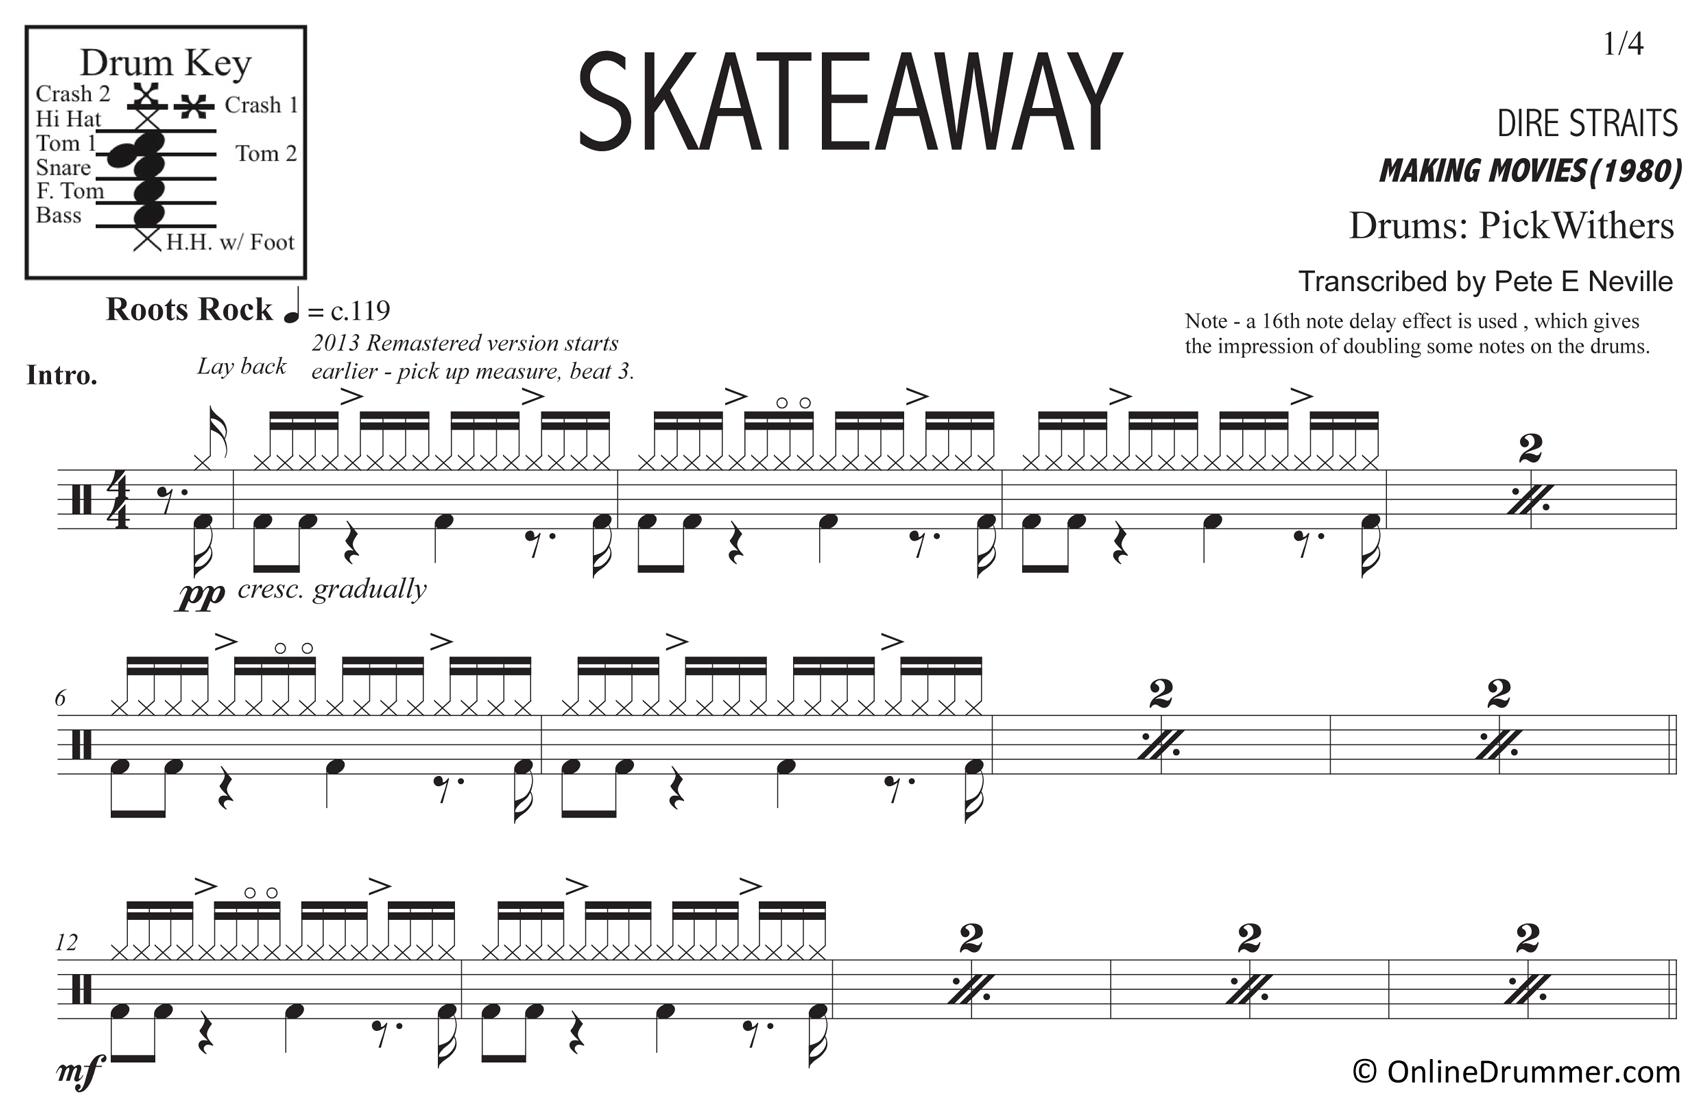 Skateaway - Dire Straits - Drum Sheet Music